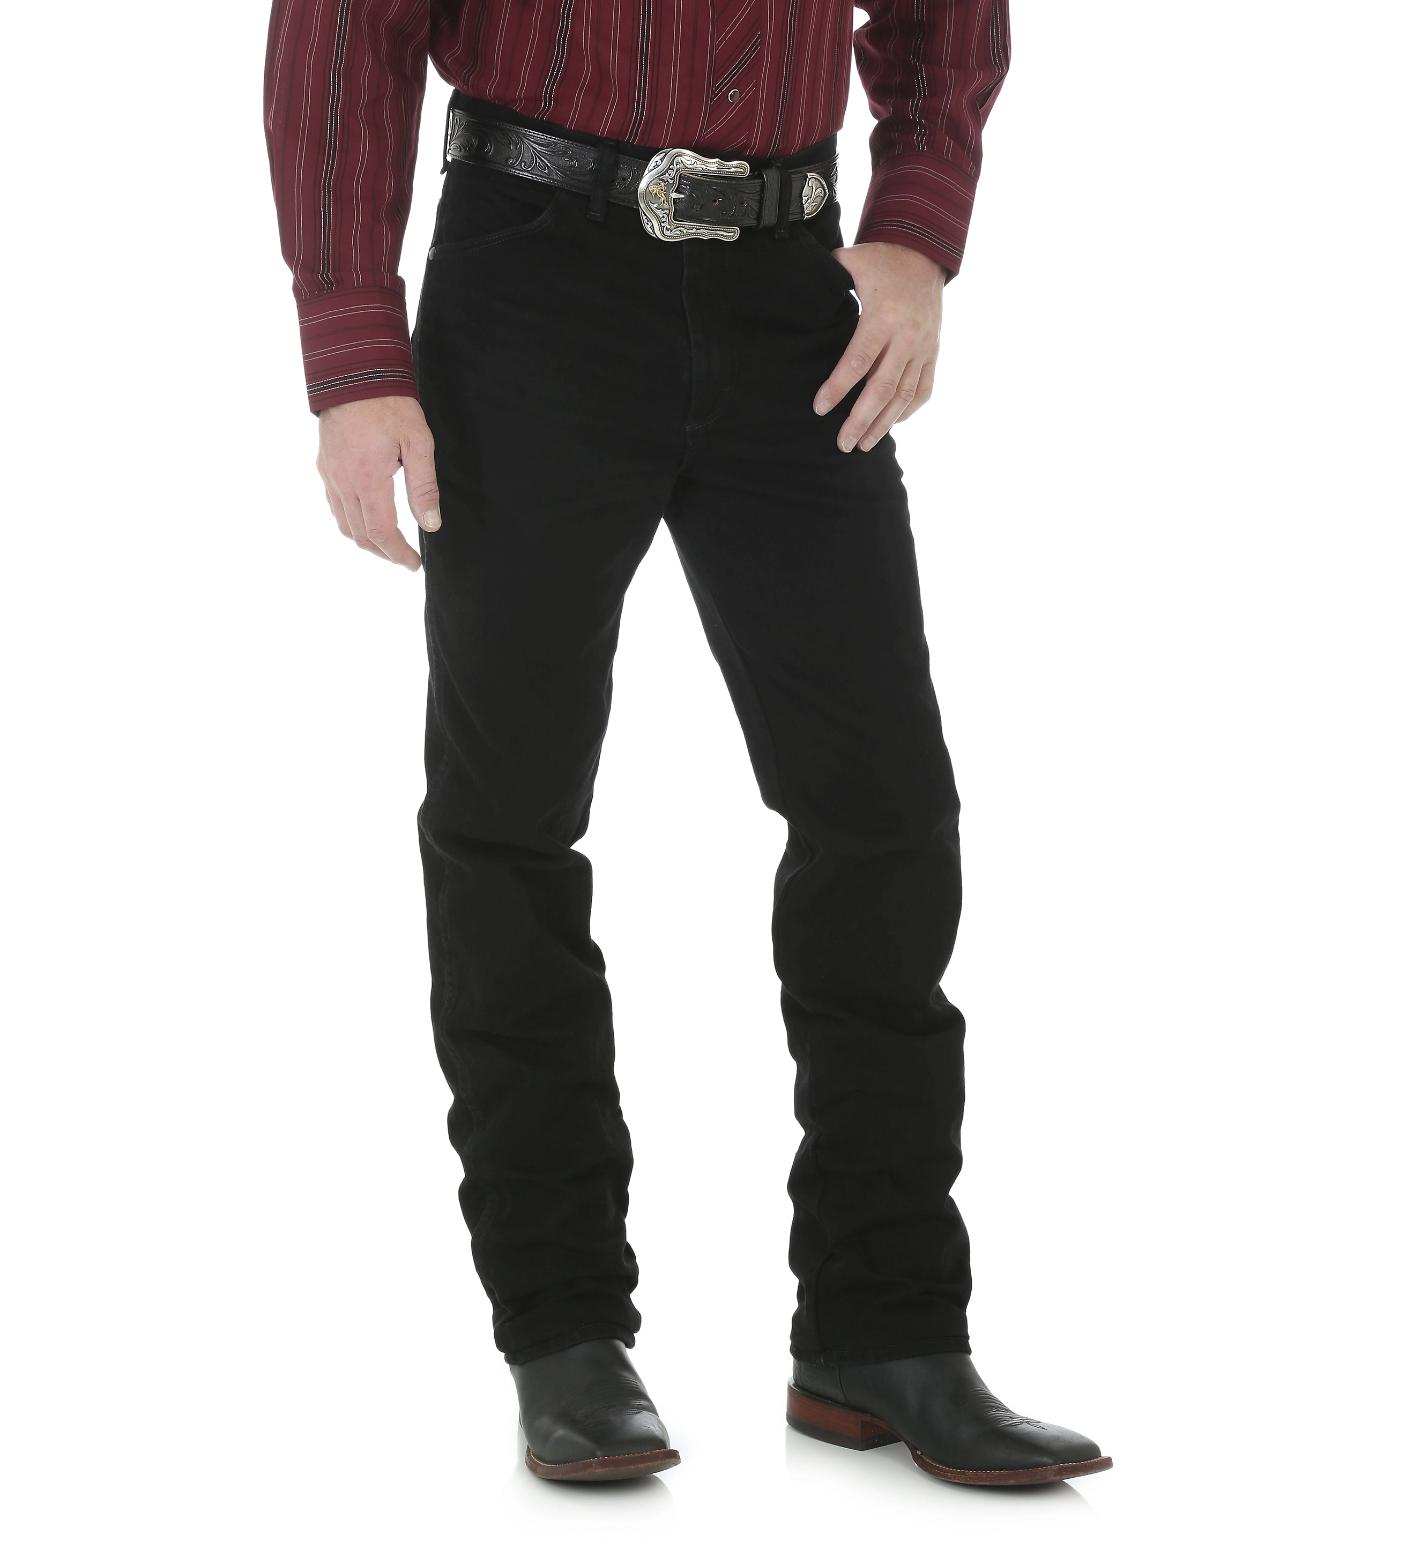 best black jeans